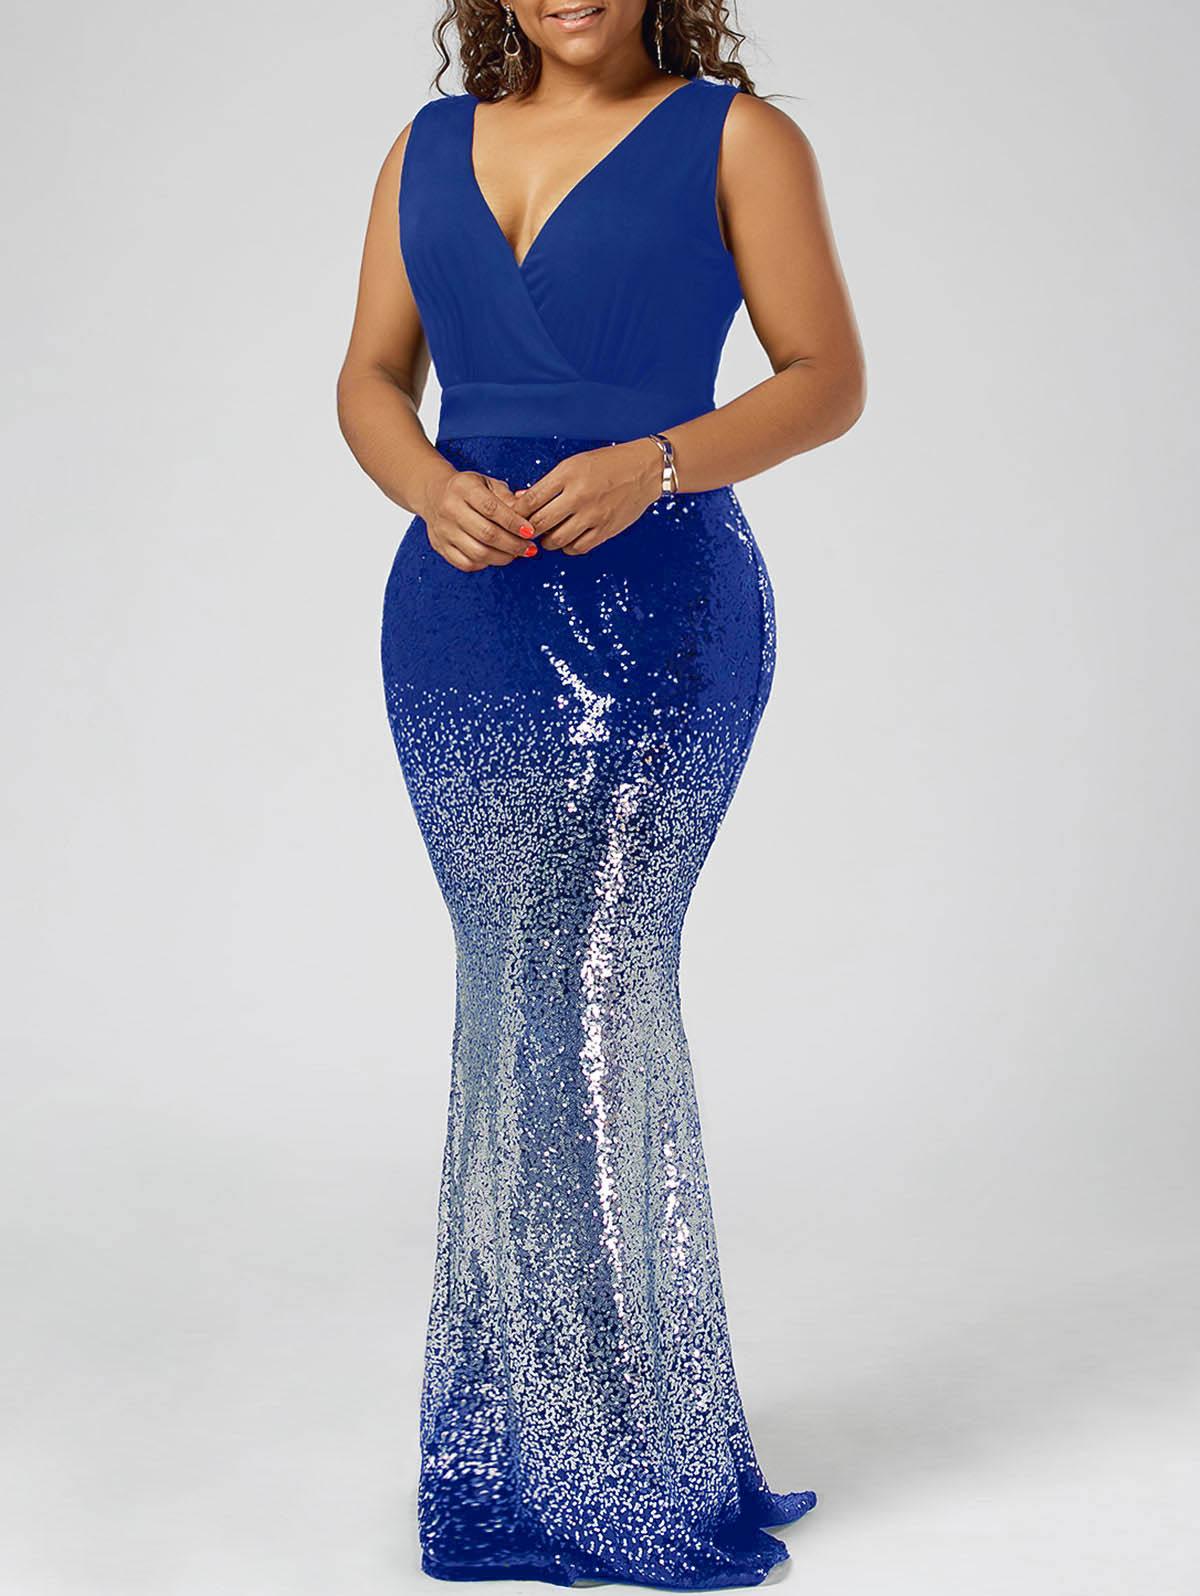 Sovalro Sequins Royal Blue Formal Party Dress Women Plus ...